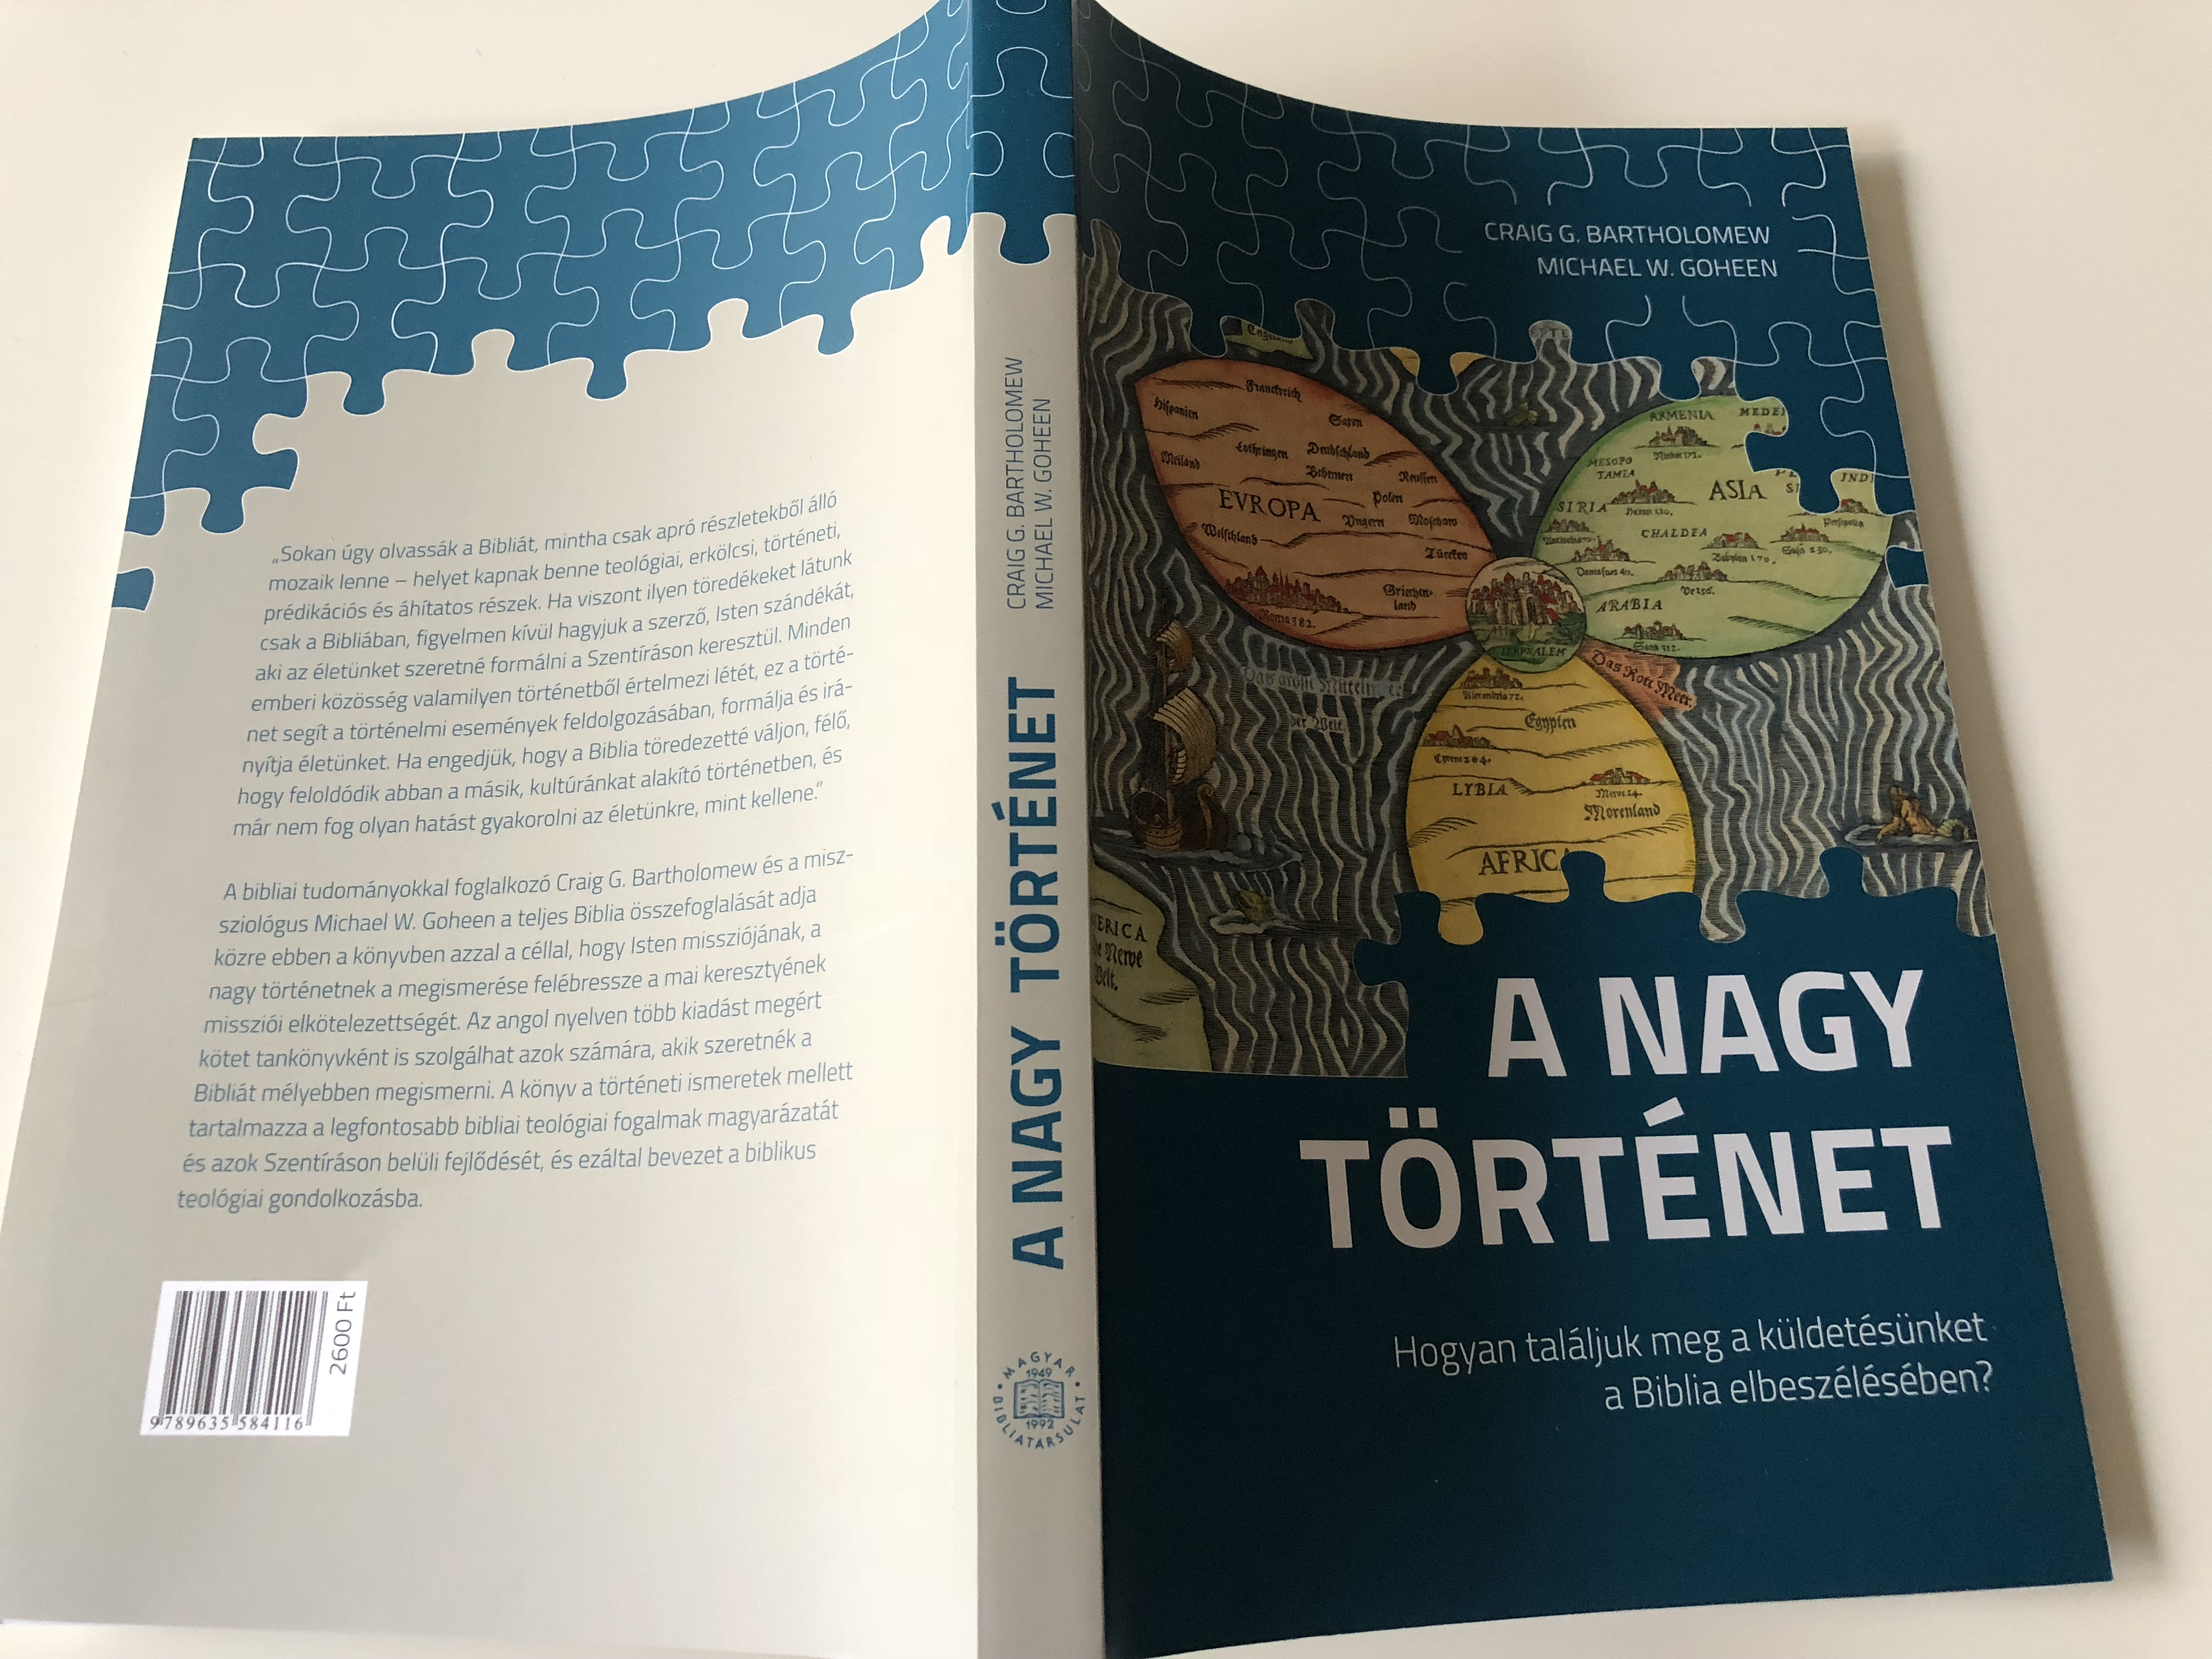 a-nagy-t-rt-net-the-drama-of-scripture-in-hungarian-language-craig-g.-bartholomew-michael-w.-goheen-k-lvin-2018-14-.jpg